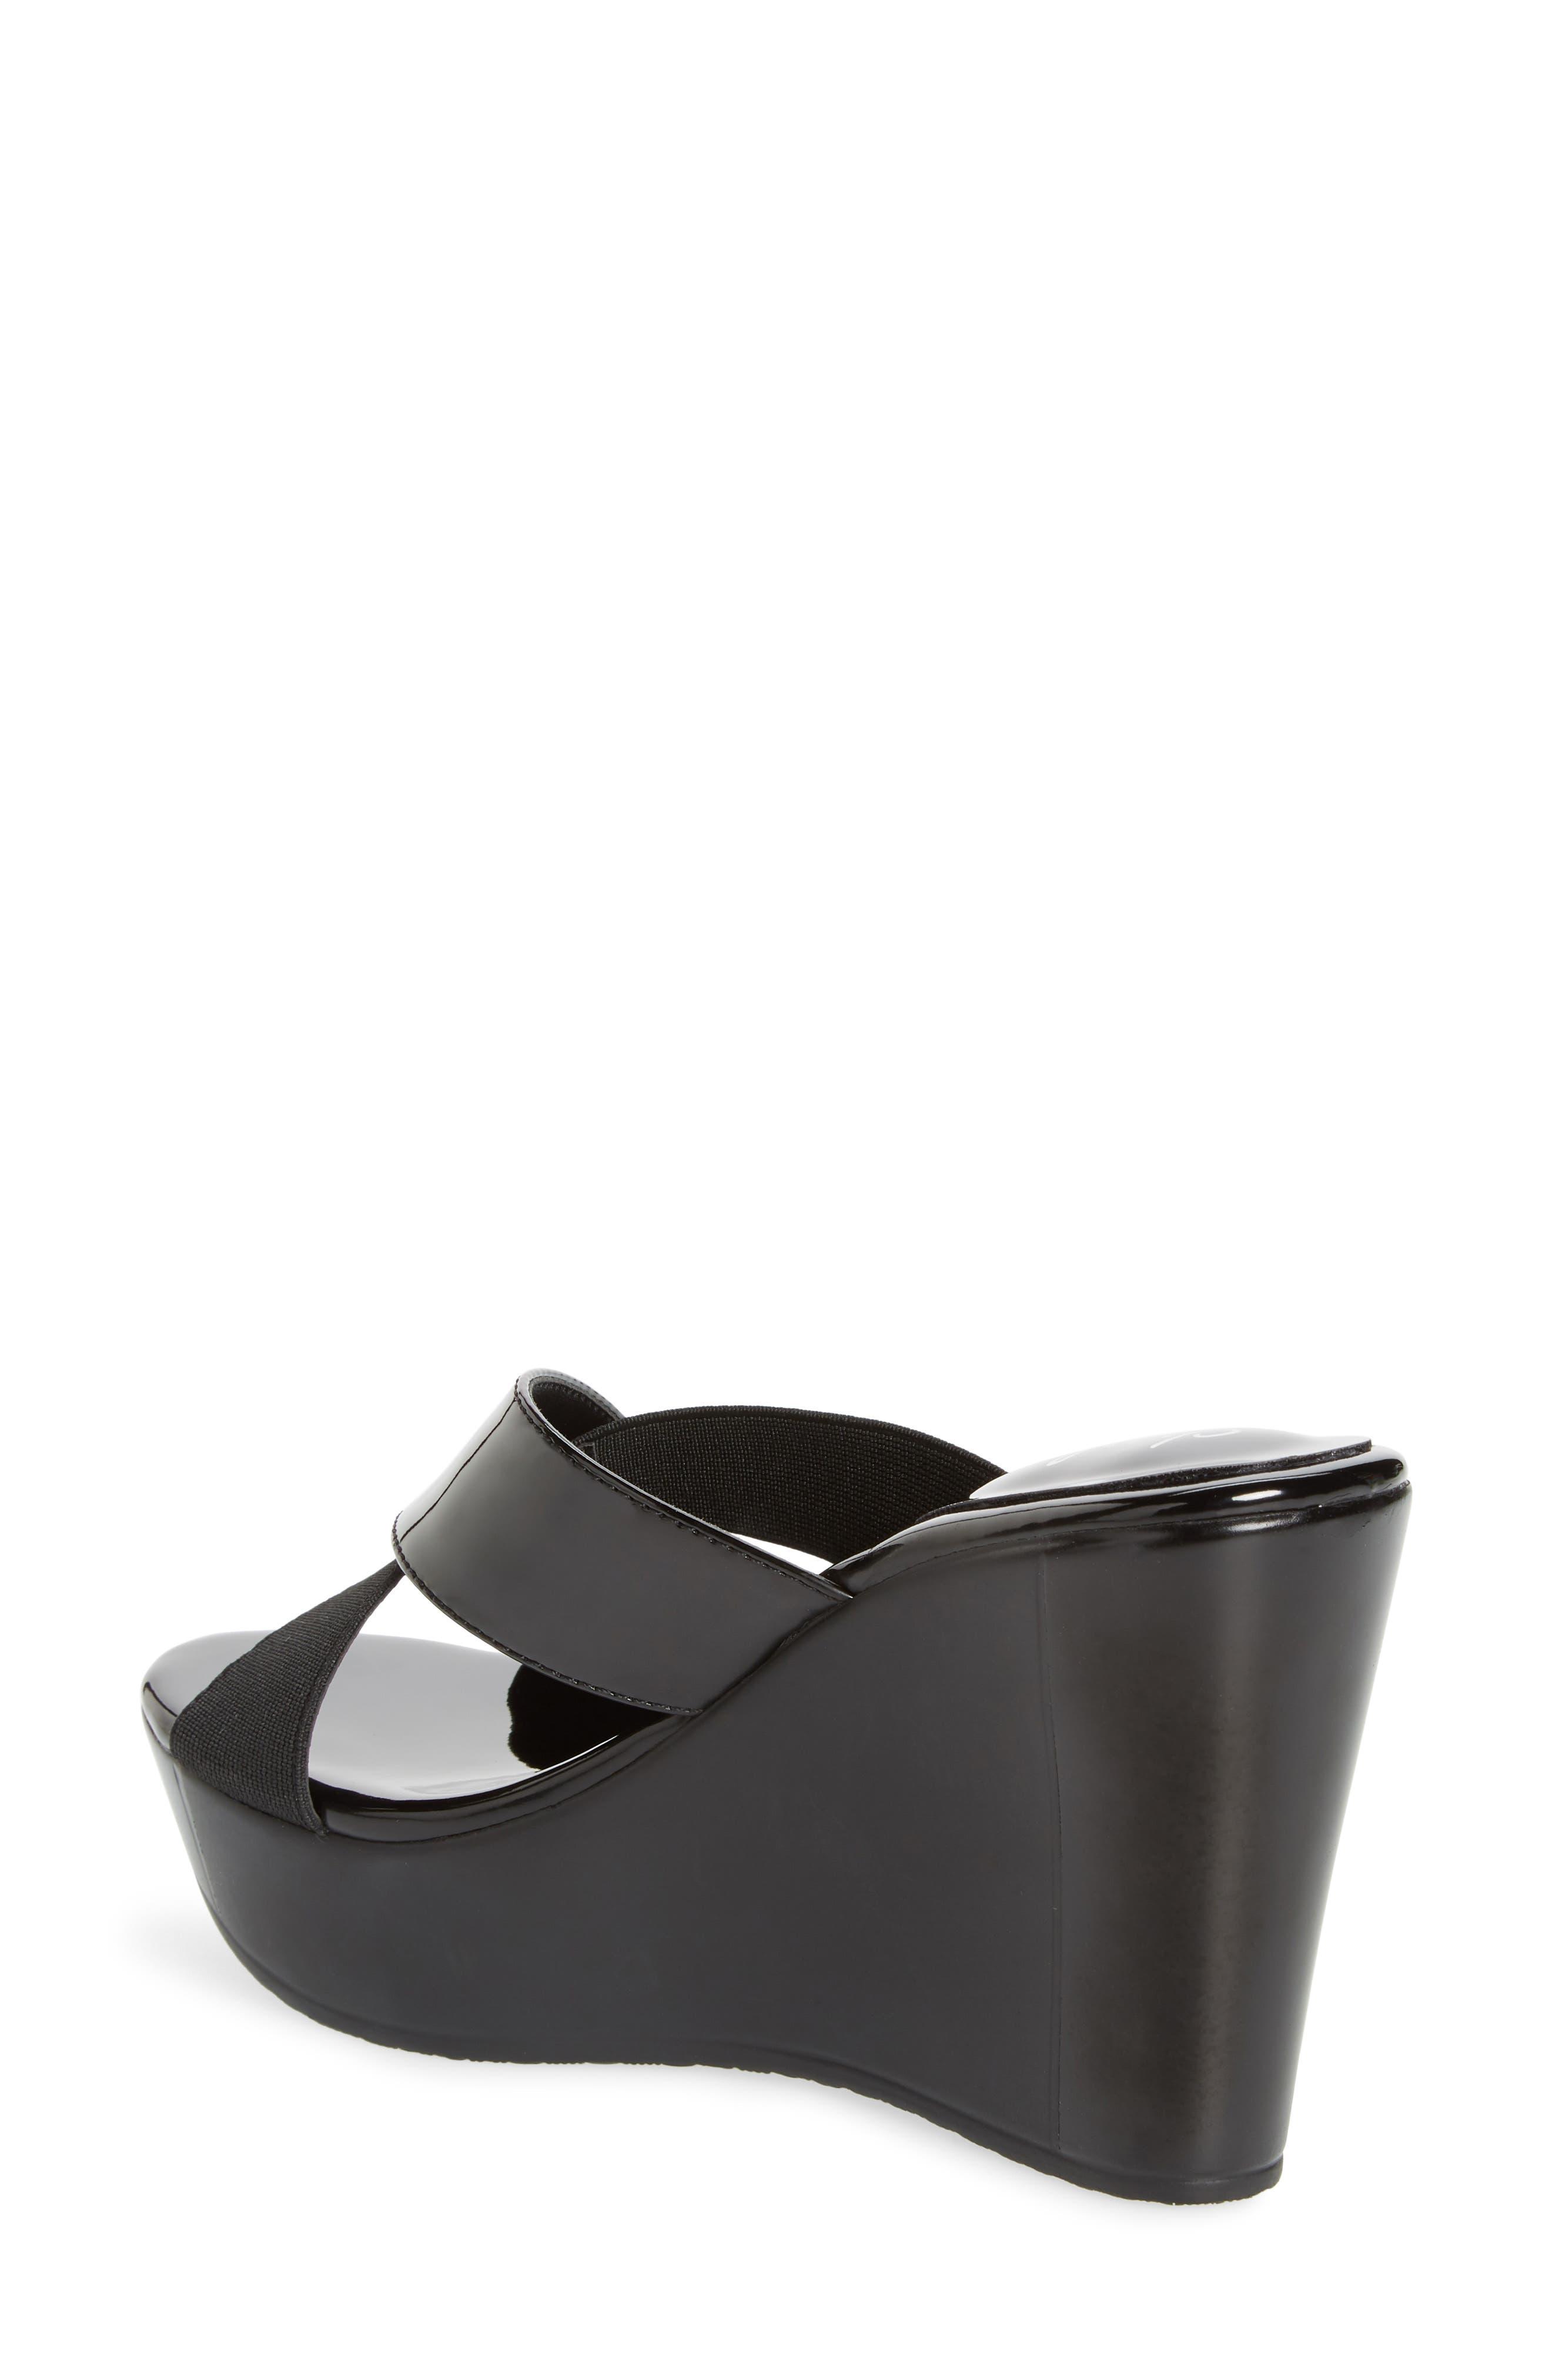 CHARLES BY CHARLES DAVID, Fuzho Platform Wedge Sandal, Alternate thumbnail 2, color, BLACK FABRIC/ FAUX PATENT